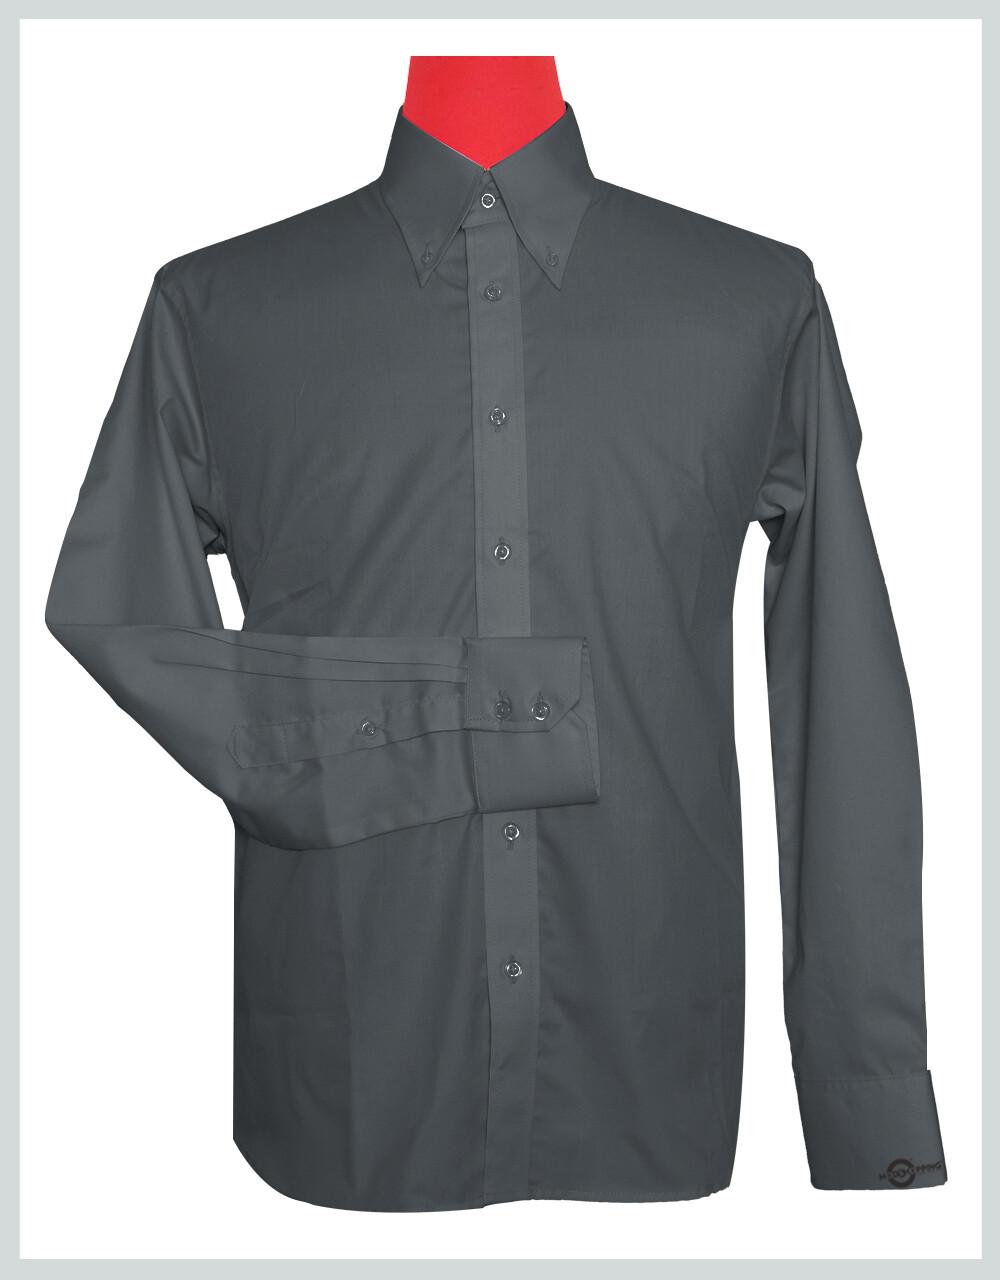 Button-Down Collar Shirt | Charcoal Grey Color Shirt